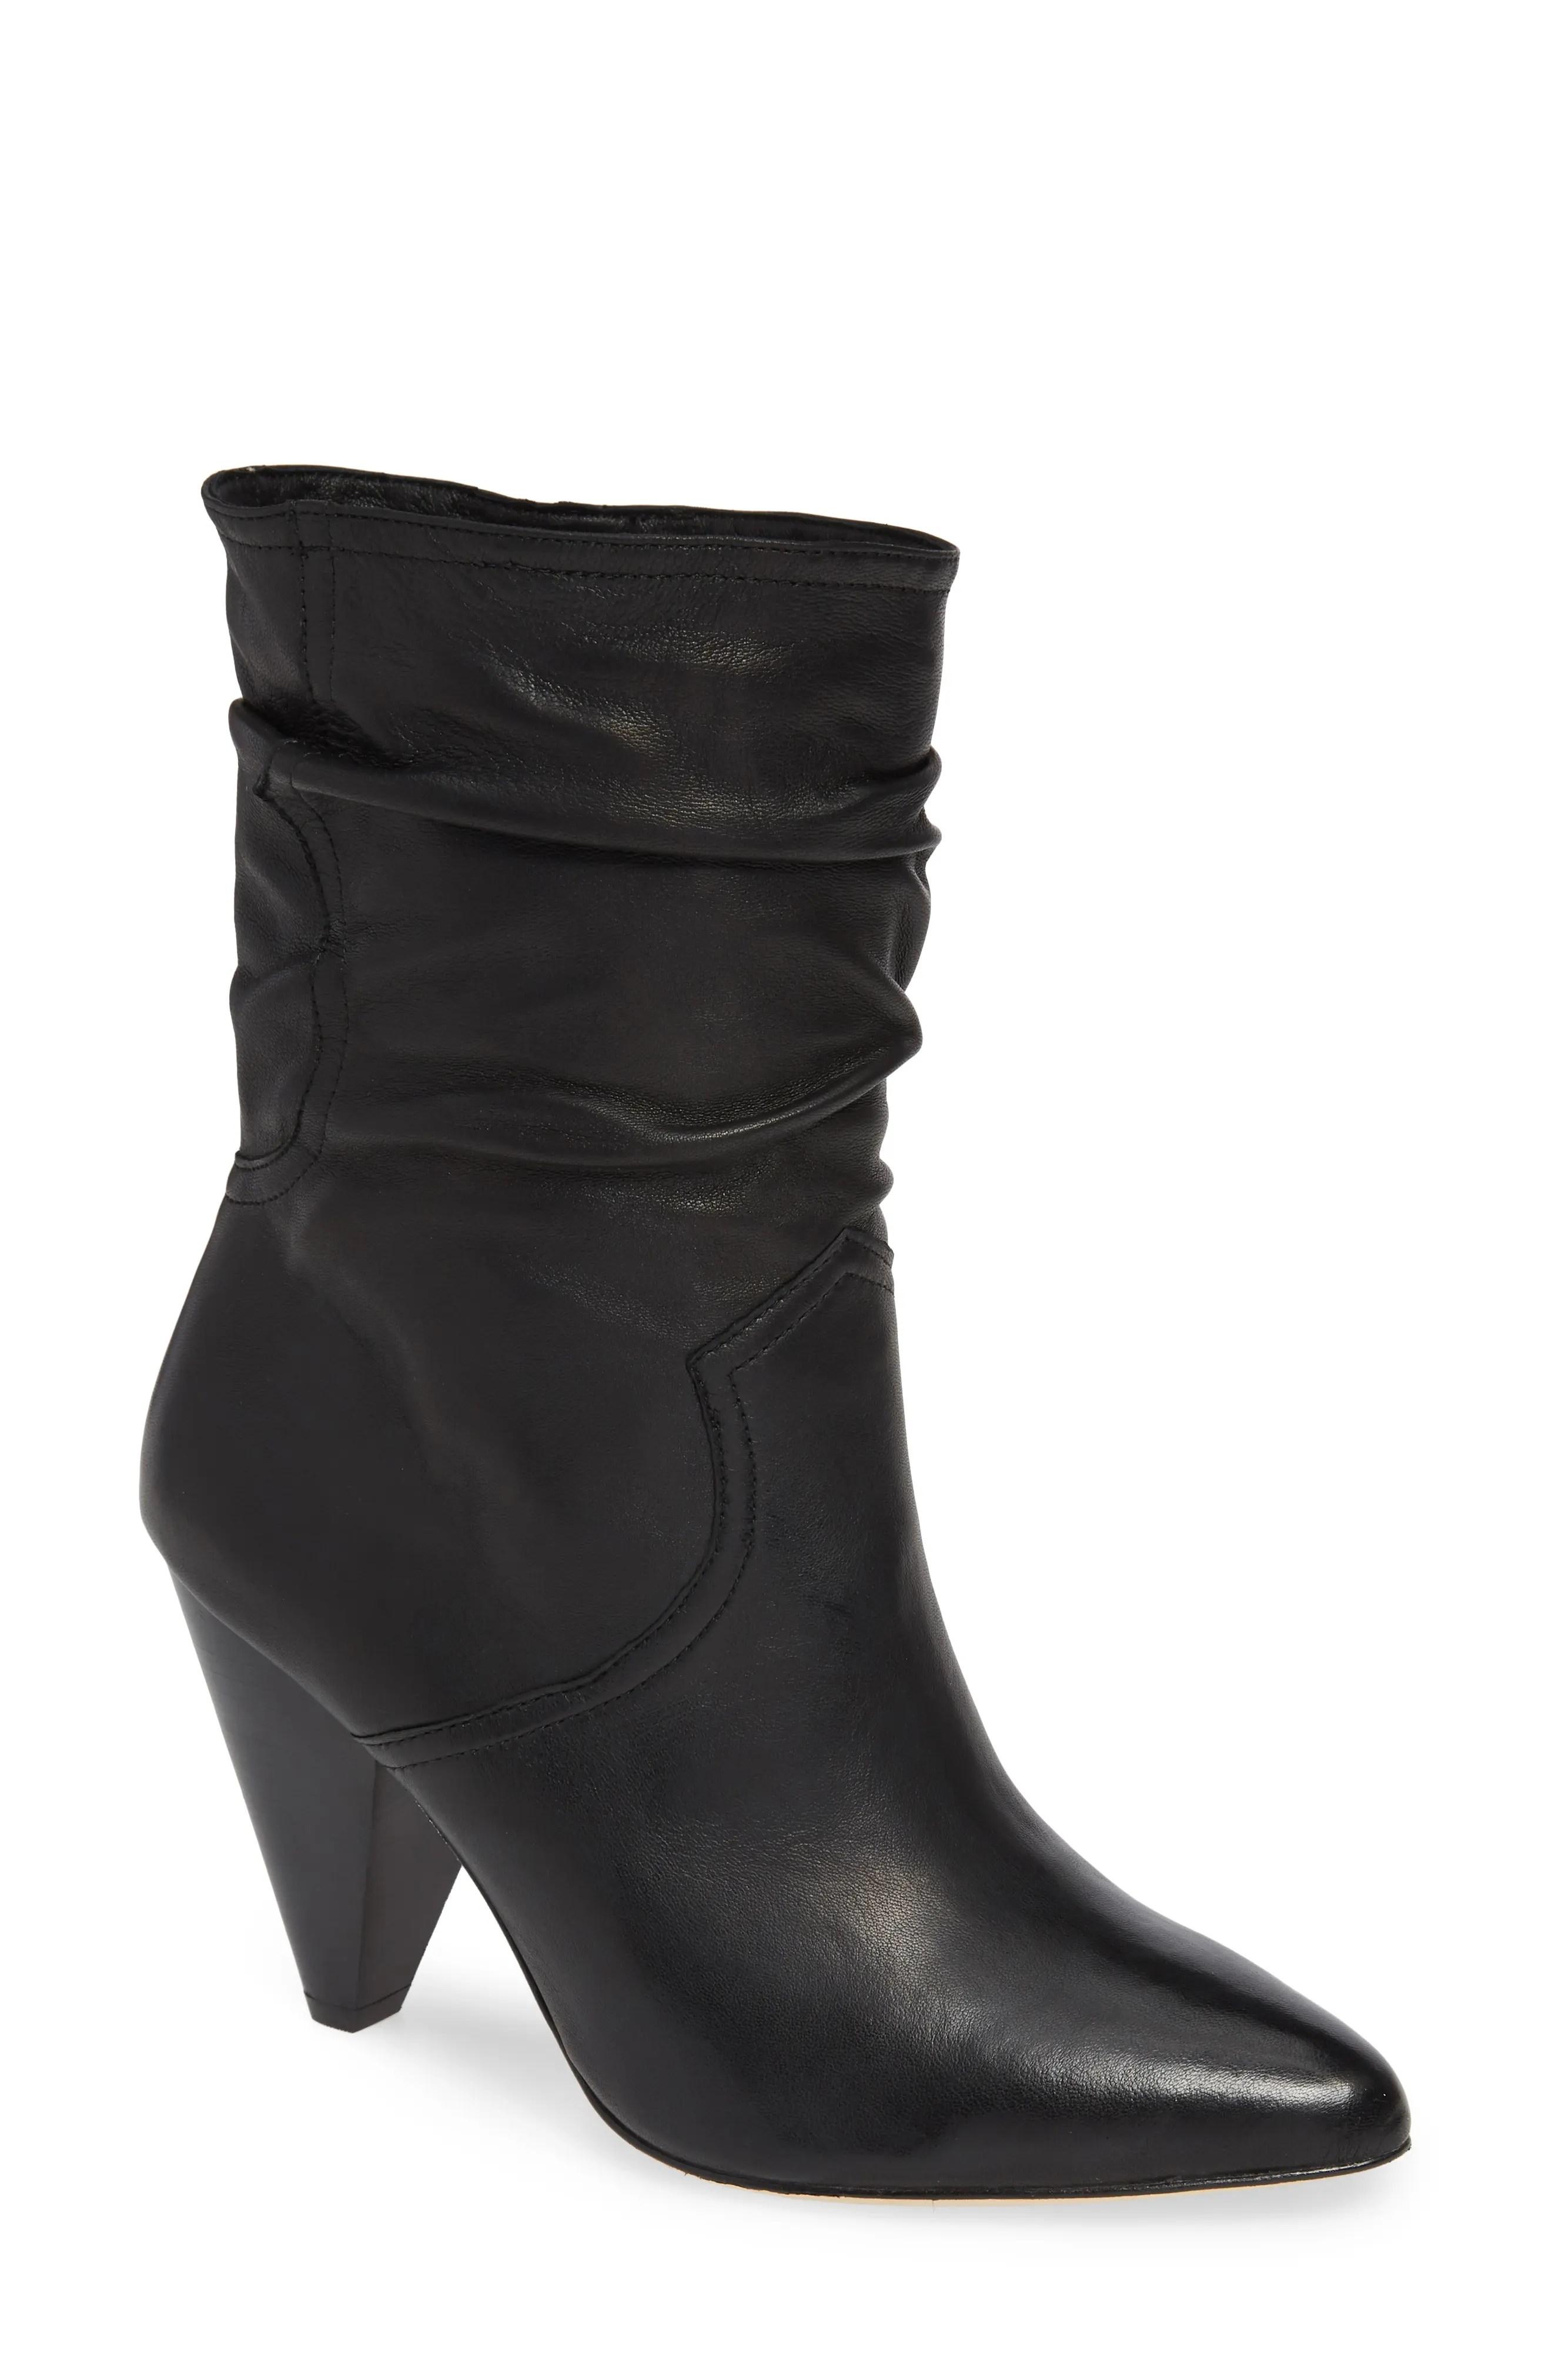 Joie gabbissy boot women also   shoes nordstrom rh shoprdstrom